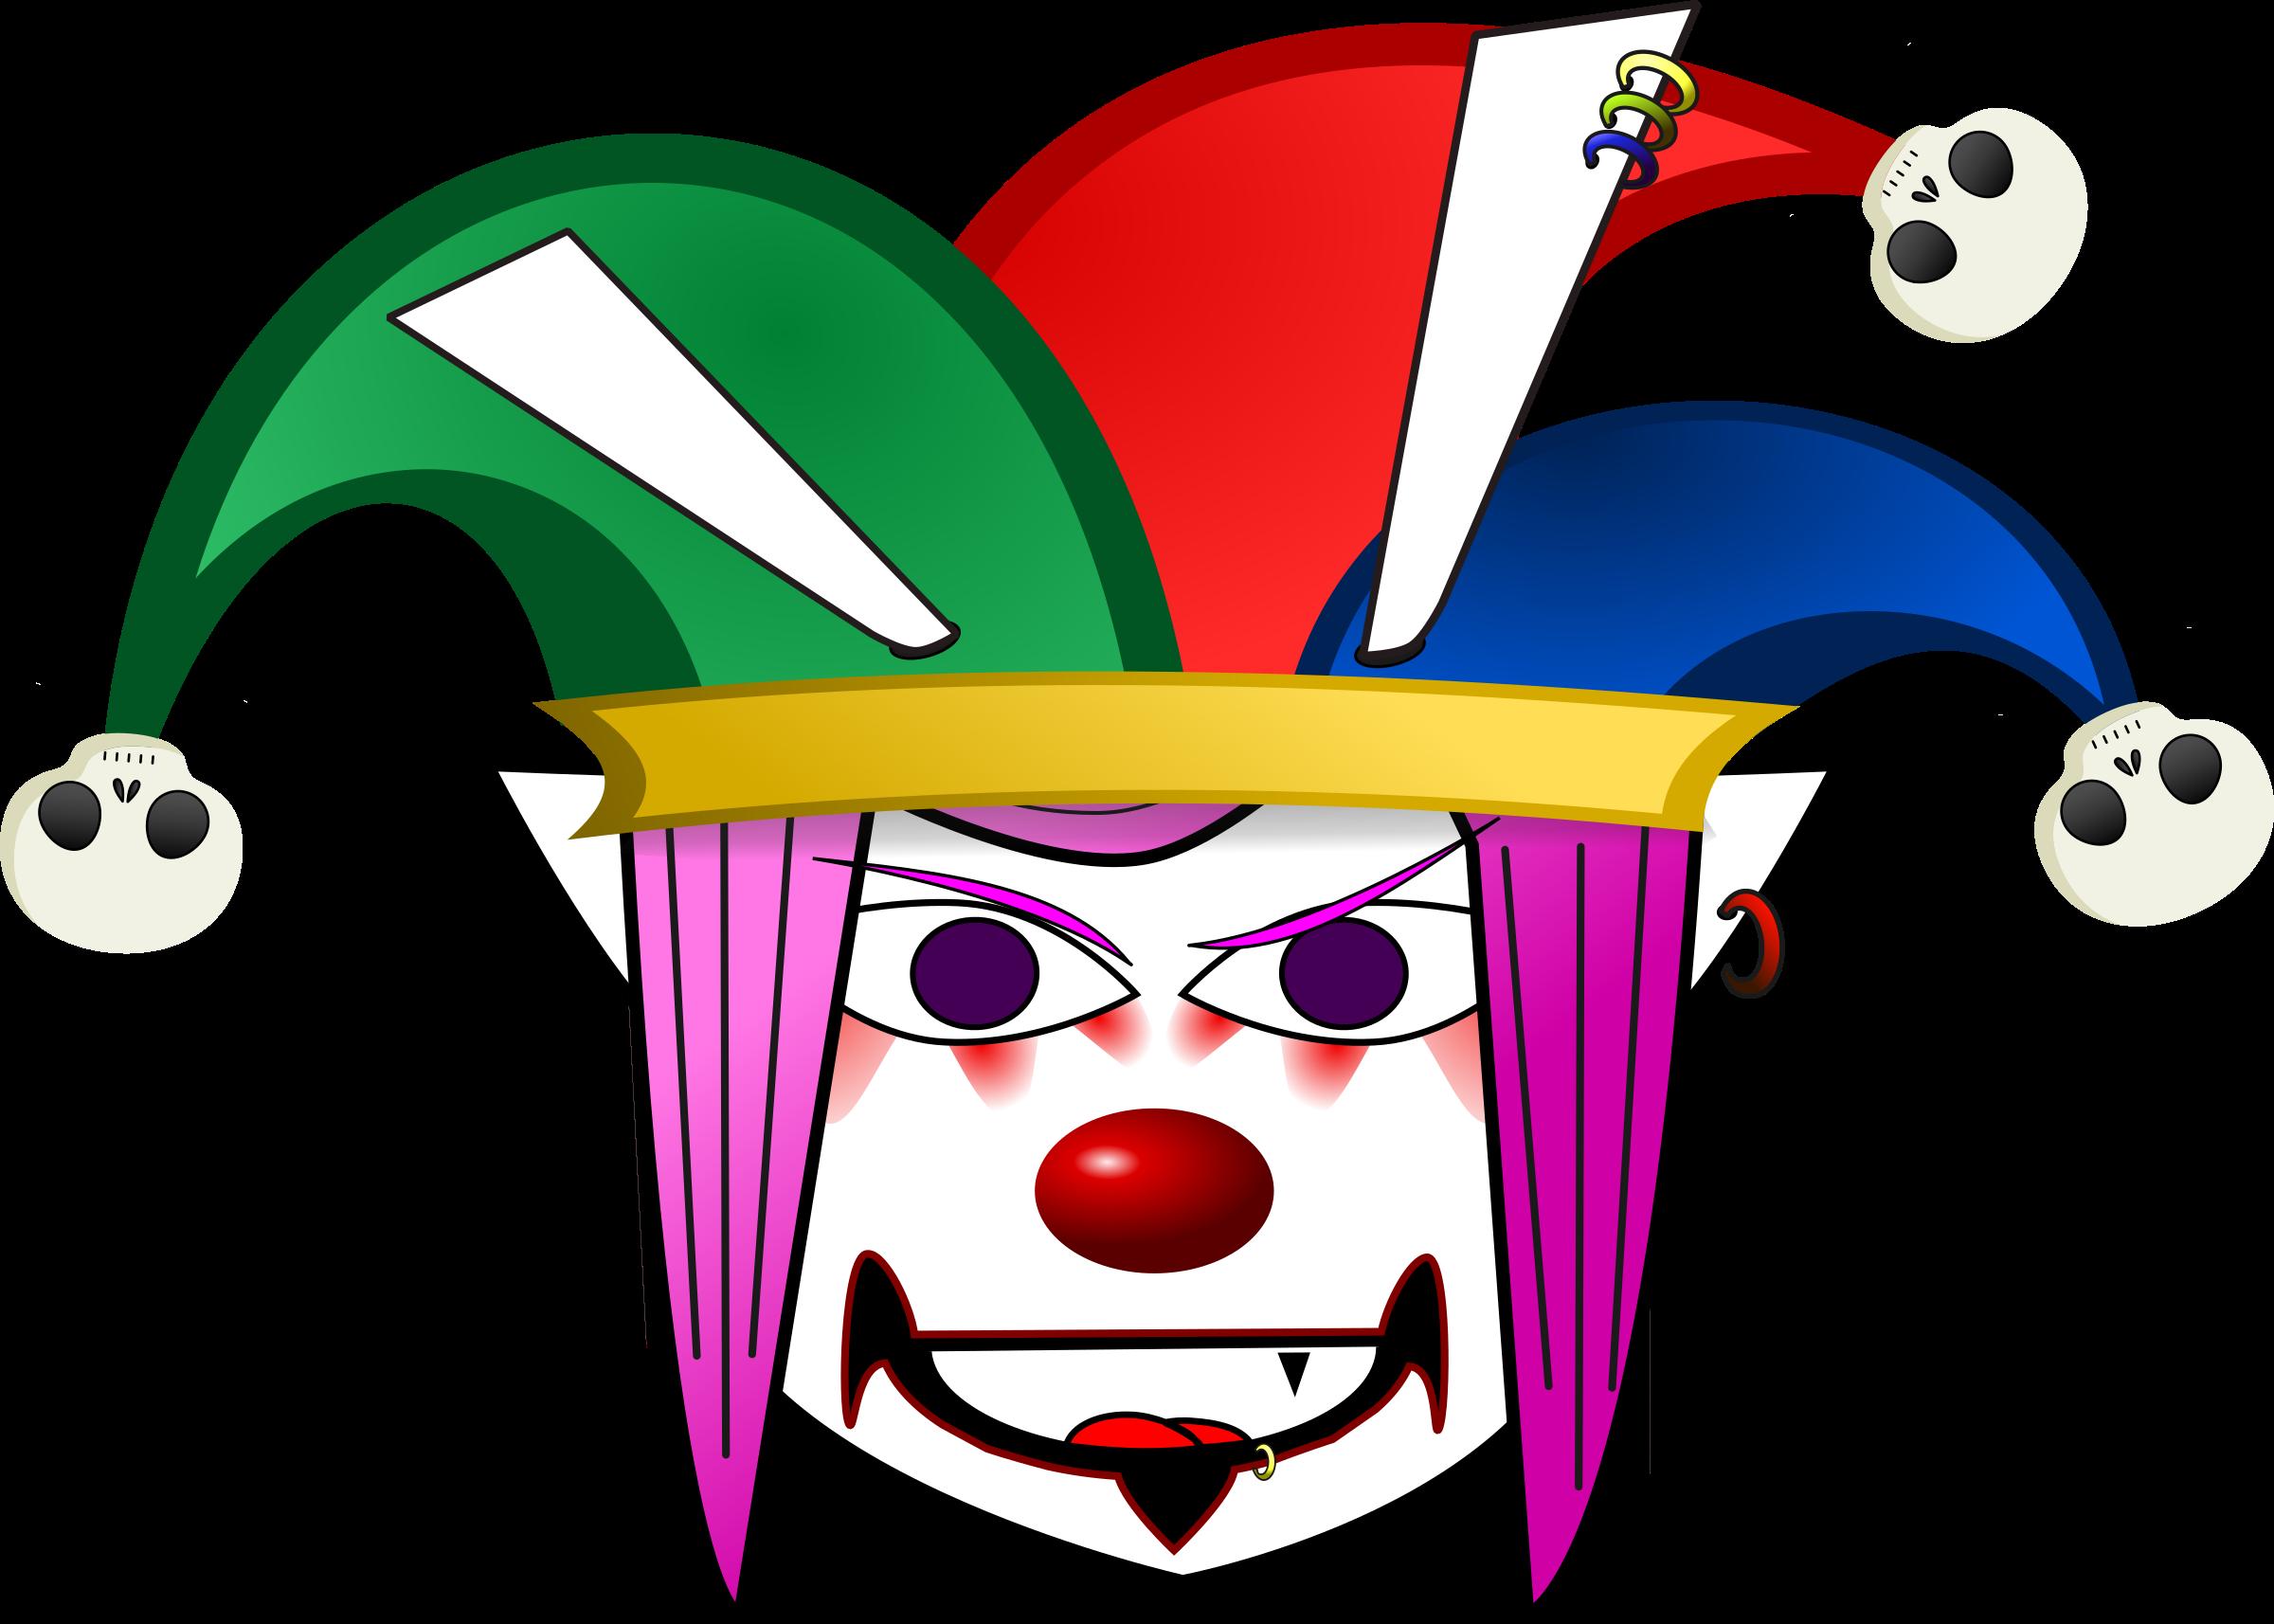 Clown big image png. Clipart phone evil